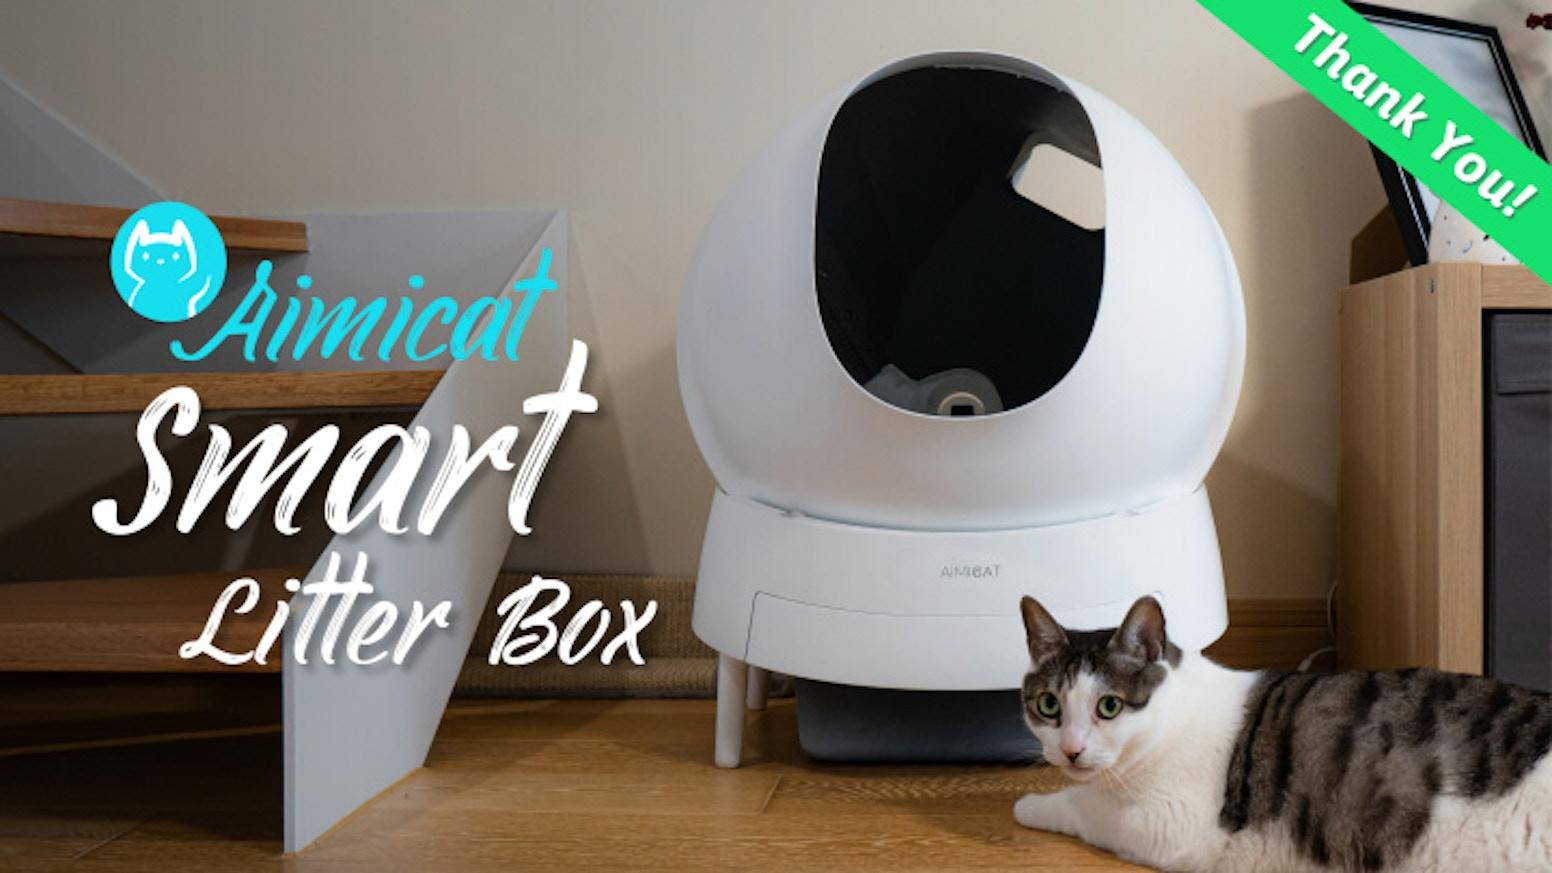 Aimicat The Automatic Kitty Litter Cleaning Companion By Aimicat Kickstarter